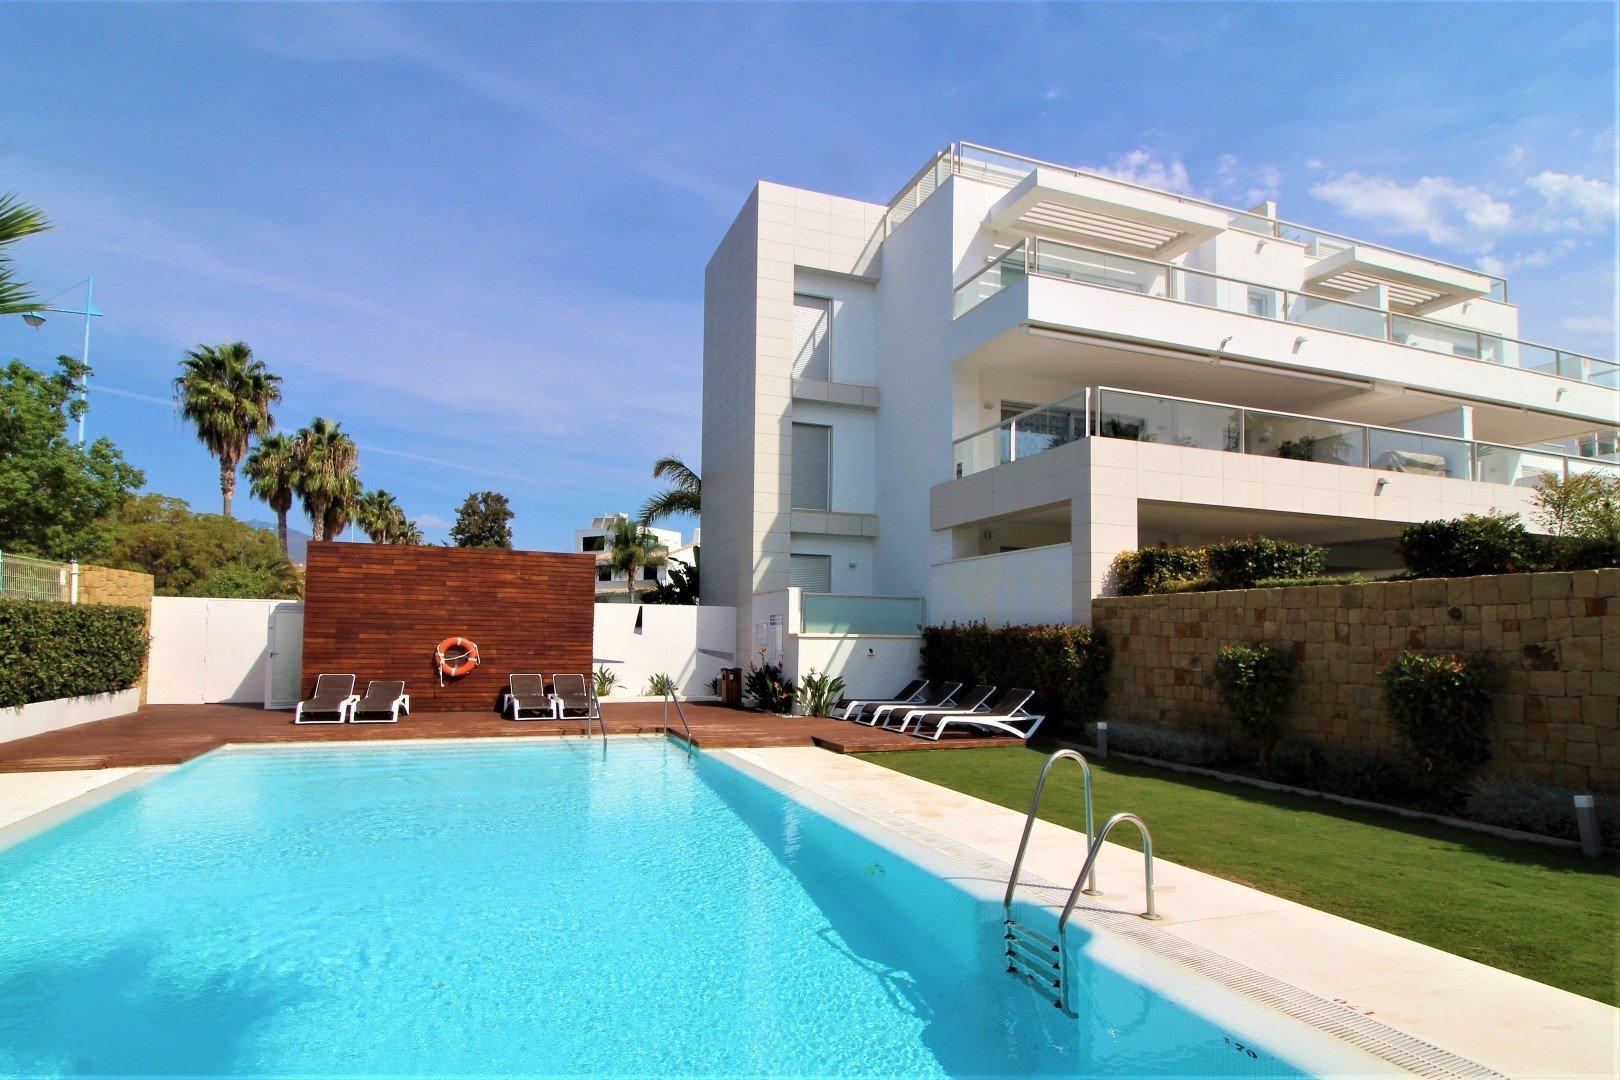 Penthouse te huur in San Pedro Alcantara, Jade Beach